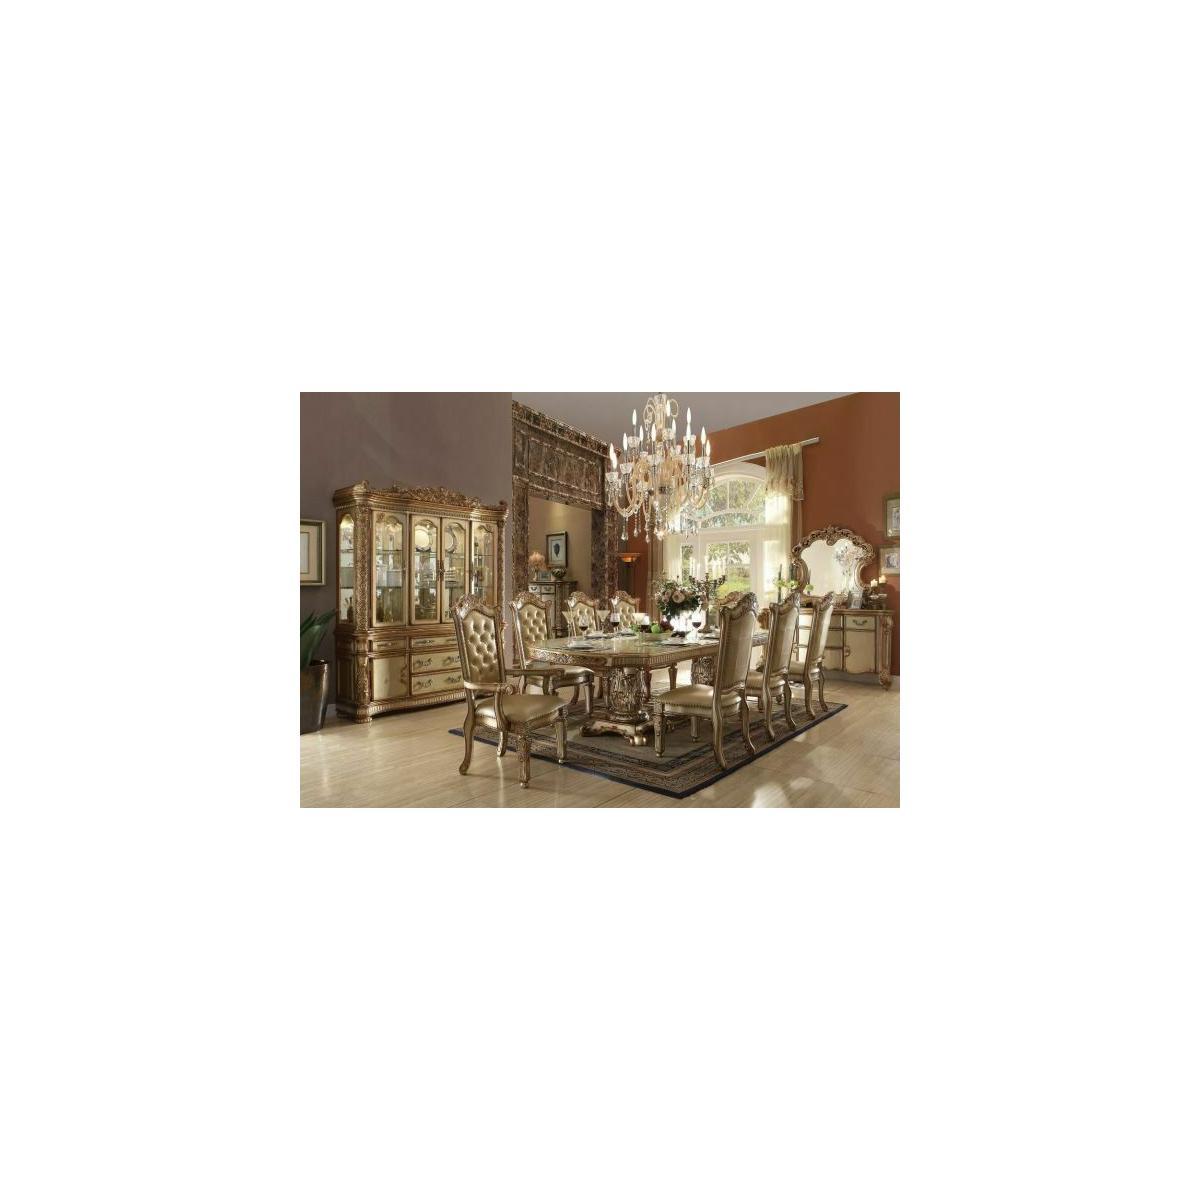 ACME Vendome Dining Table w/Double Pedestal - 63000 - Gold Patina & Bone